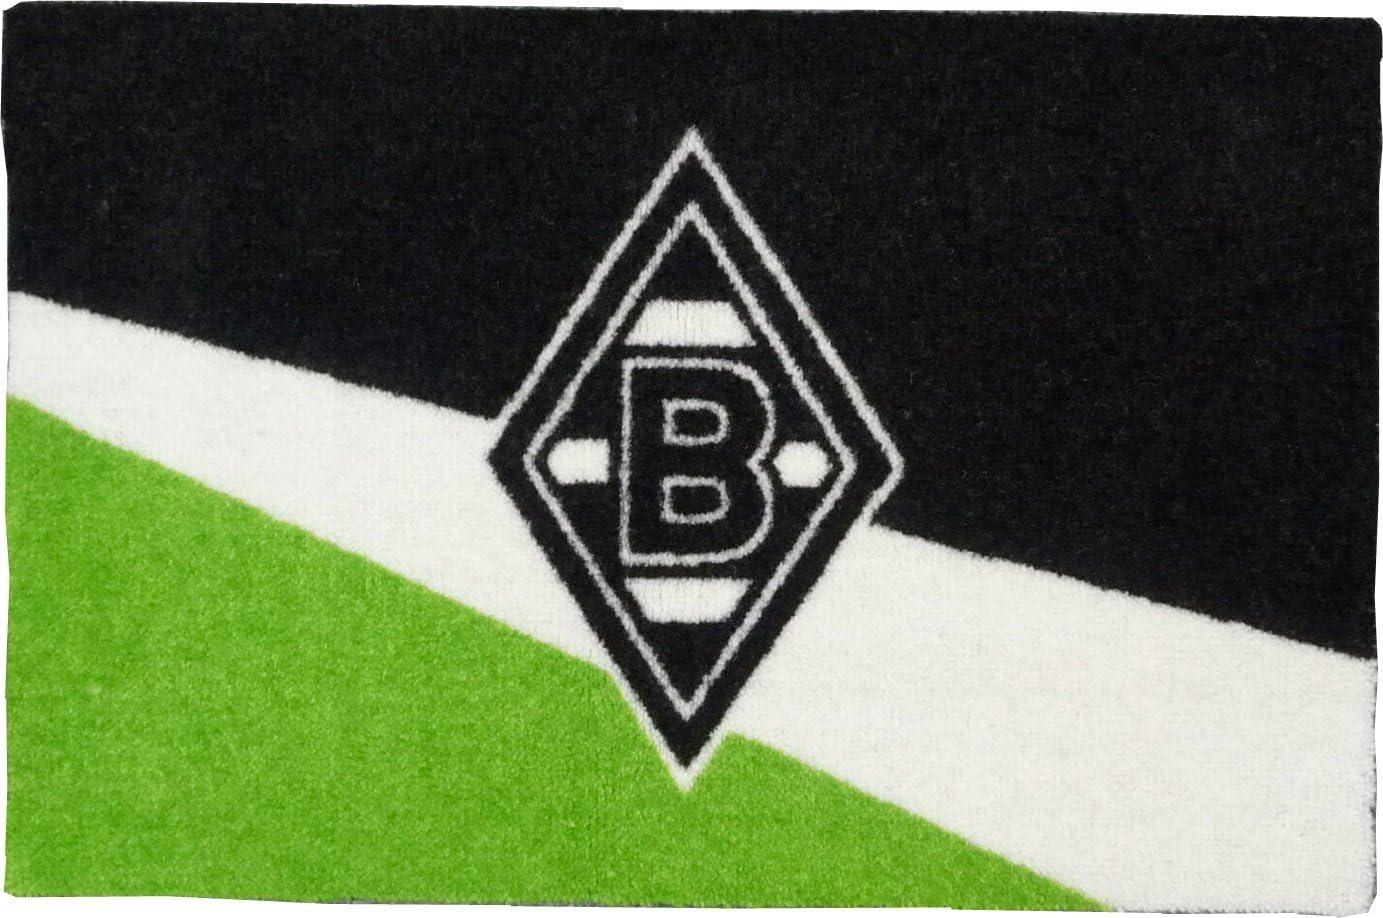 FU/ßMATTE ABTRETER VFL BORUSSIA M/ÖNCHENGLADBACH